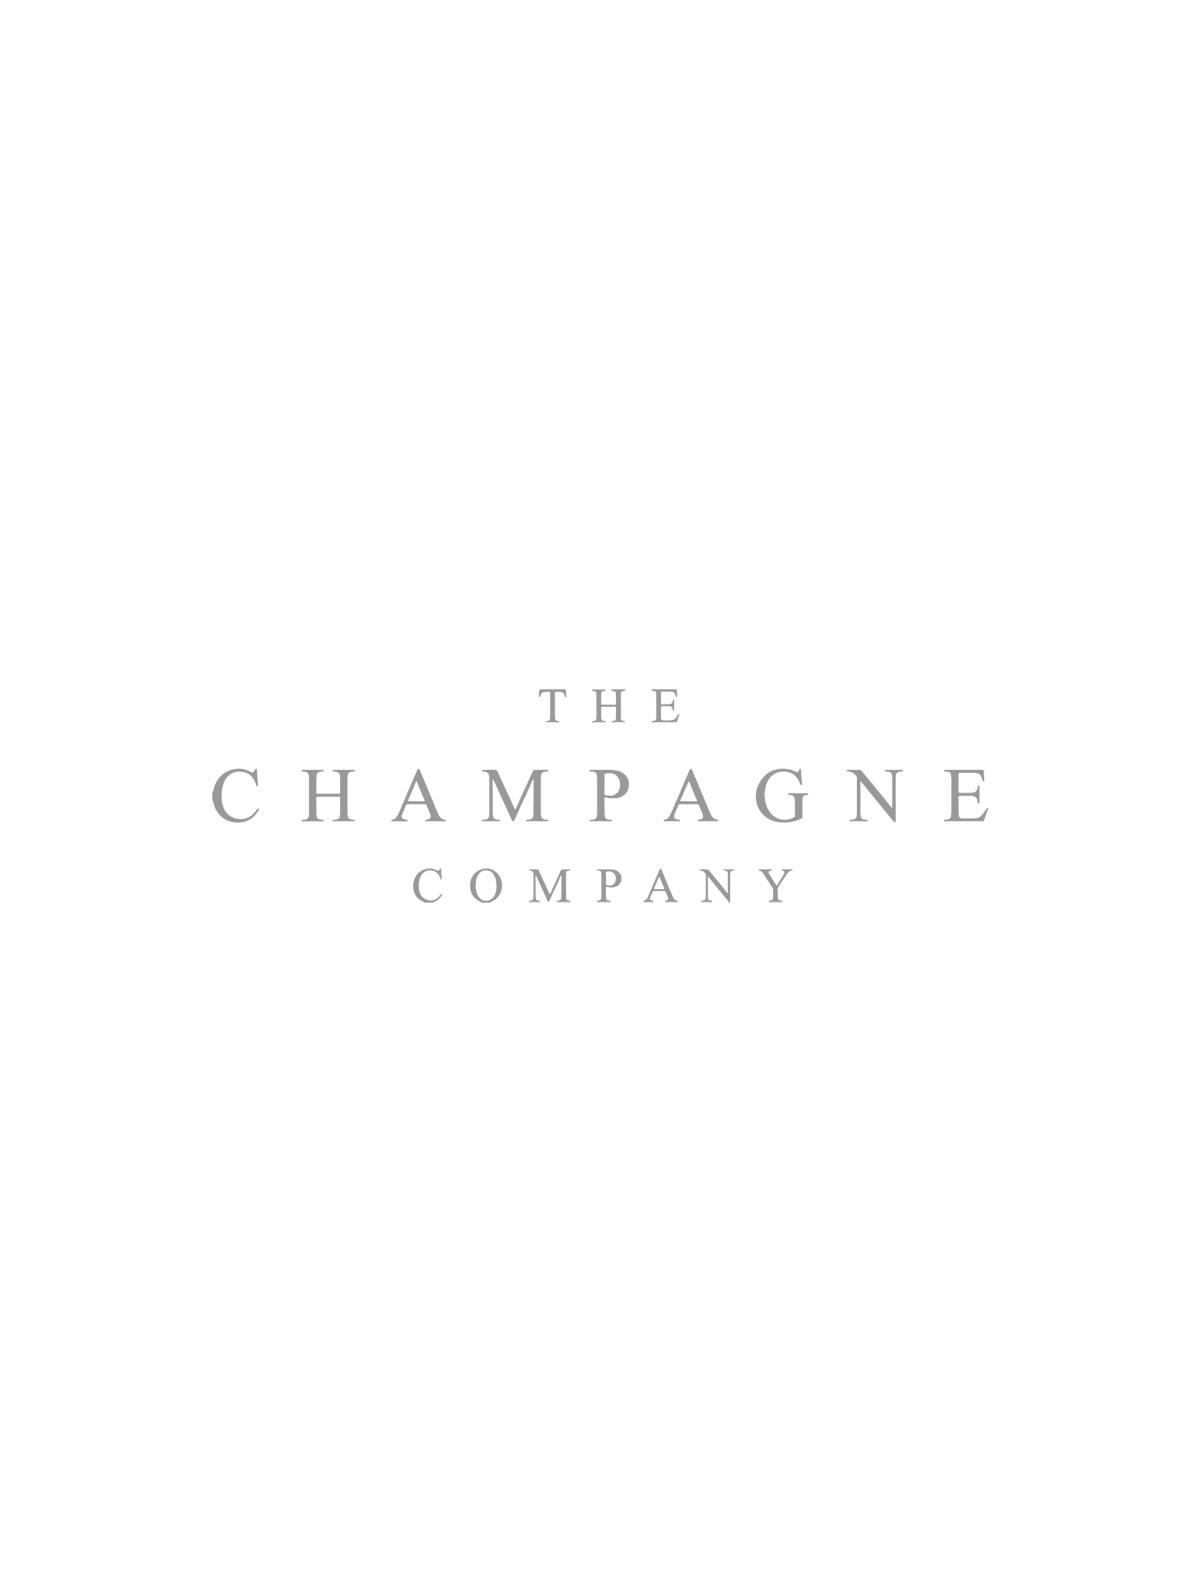 Piper Heidsieck Champagne Brut NV 75cl